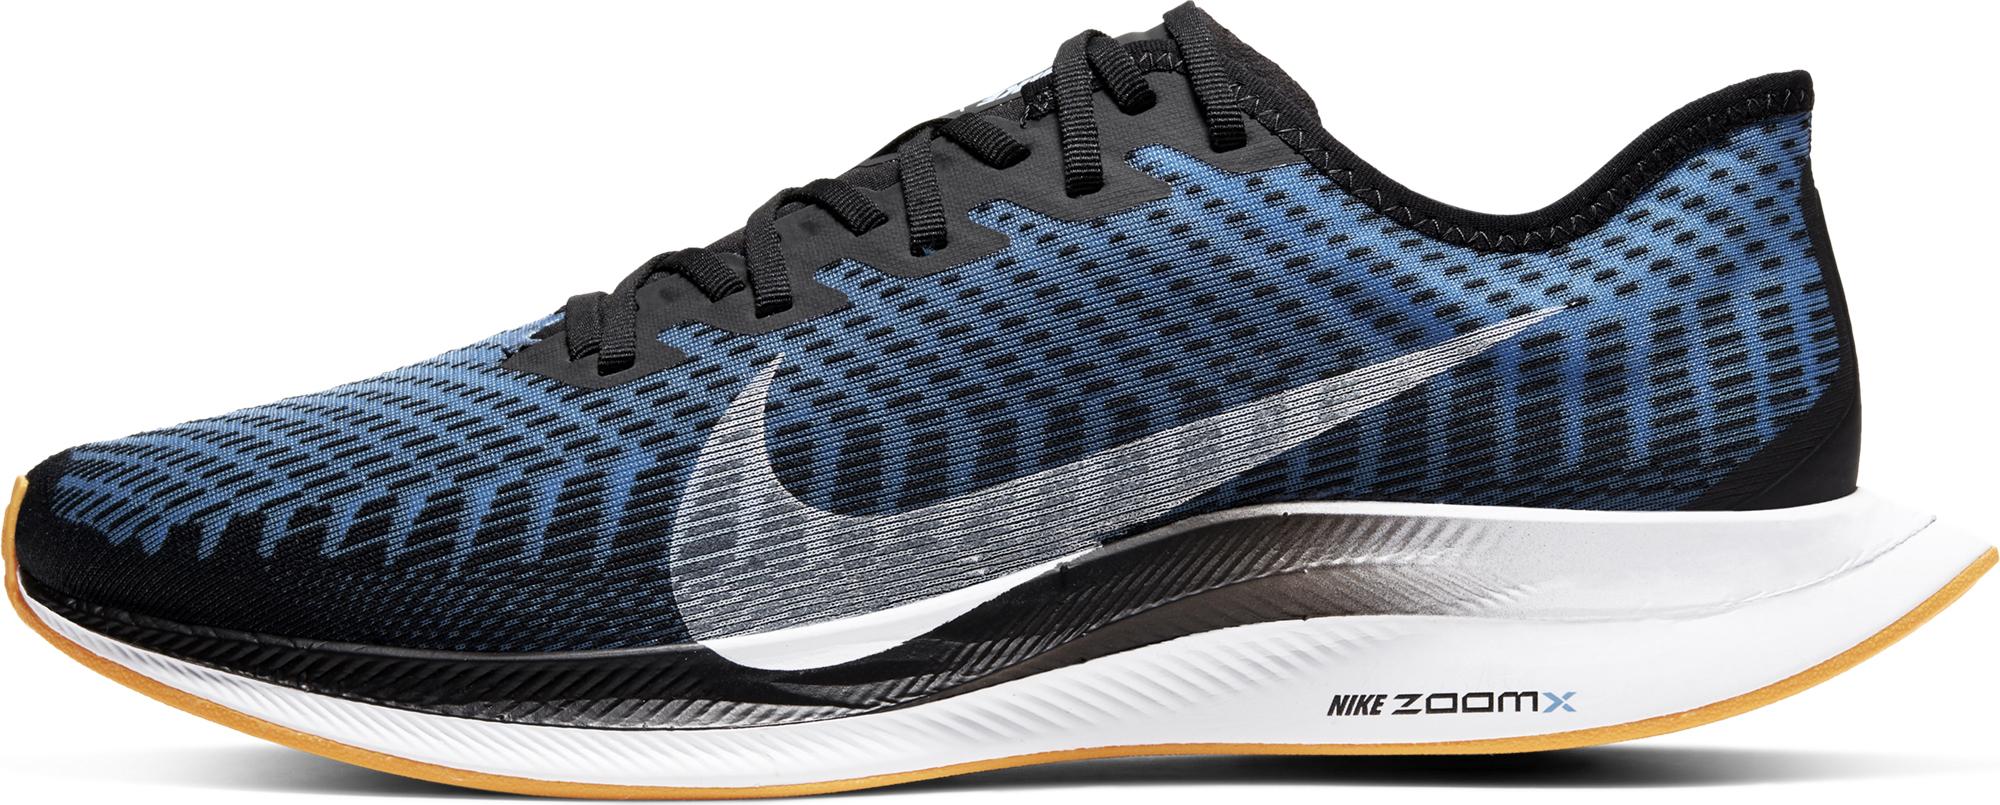 Nike Кроссовки мужские Nike Zoom Pegasus Turbo 2, размер 45 цена